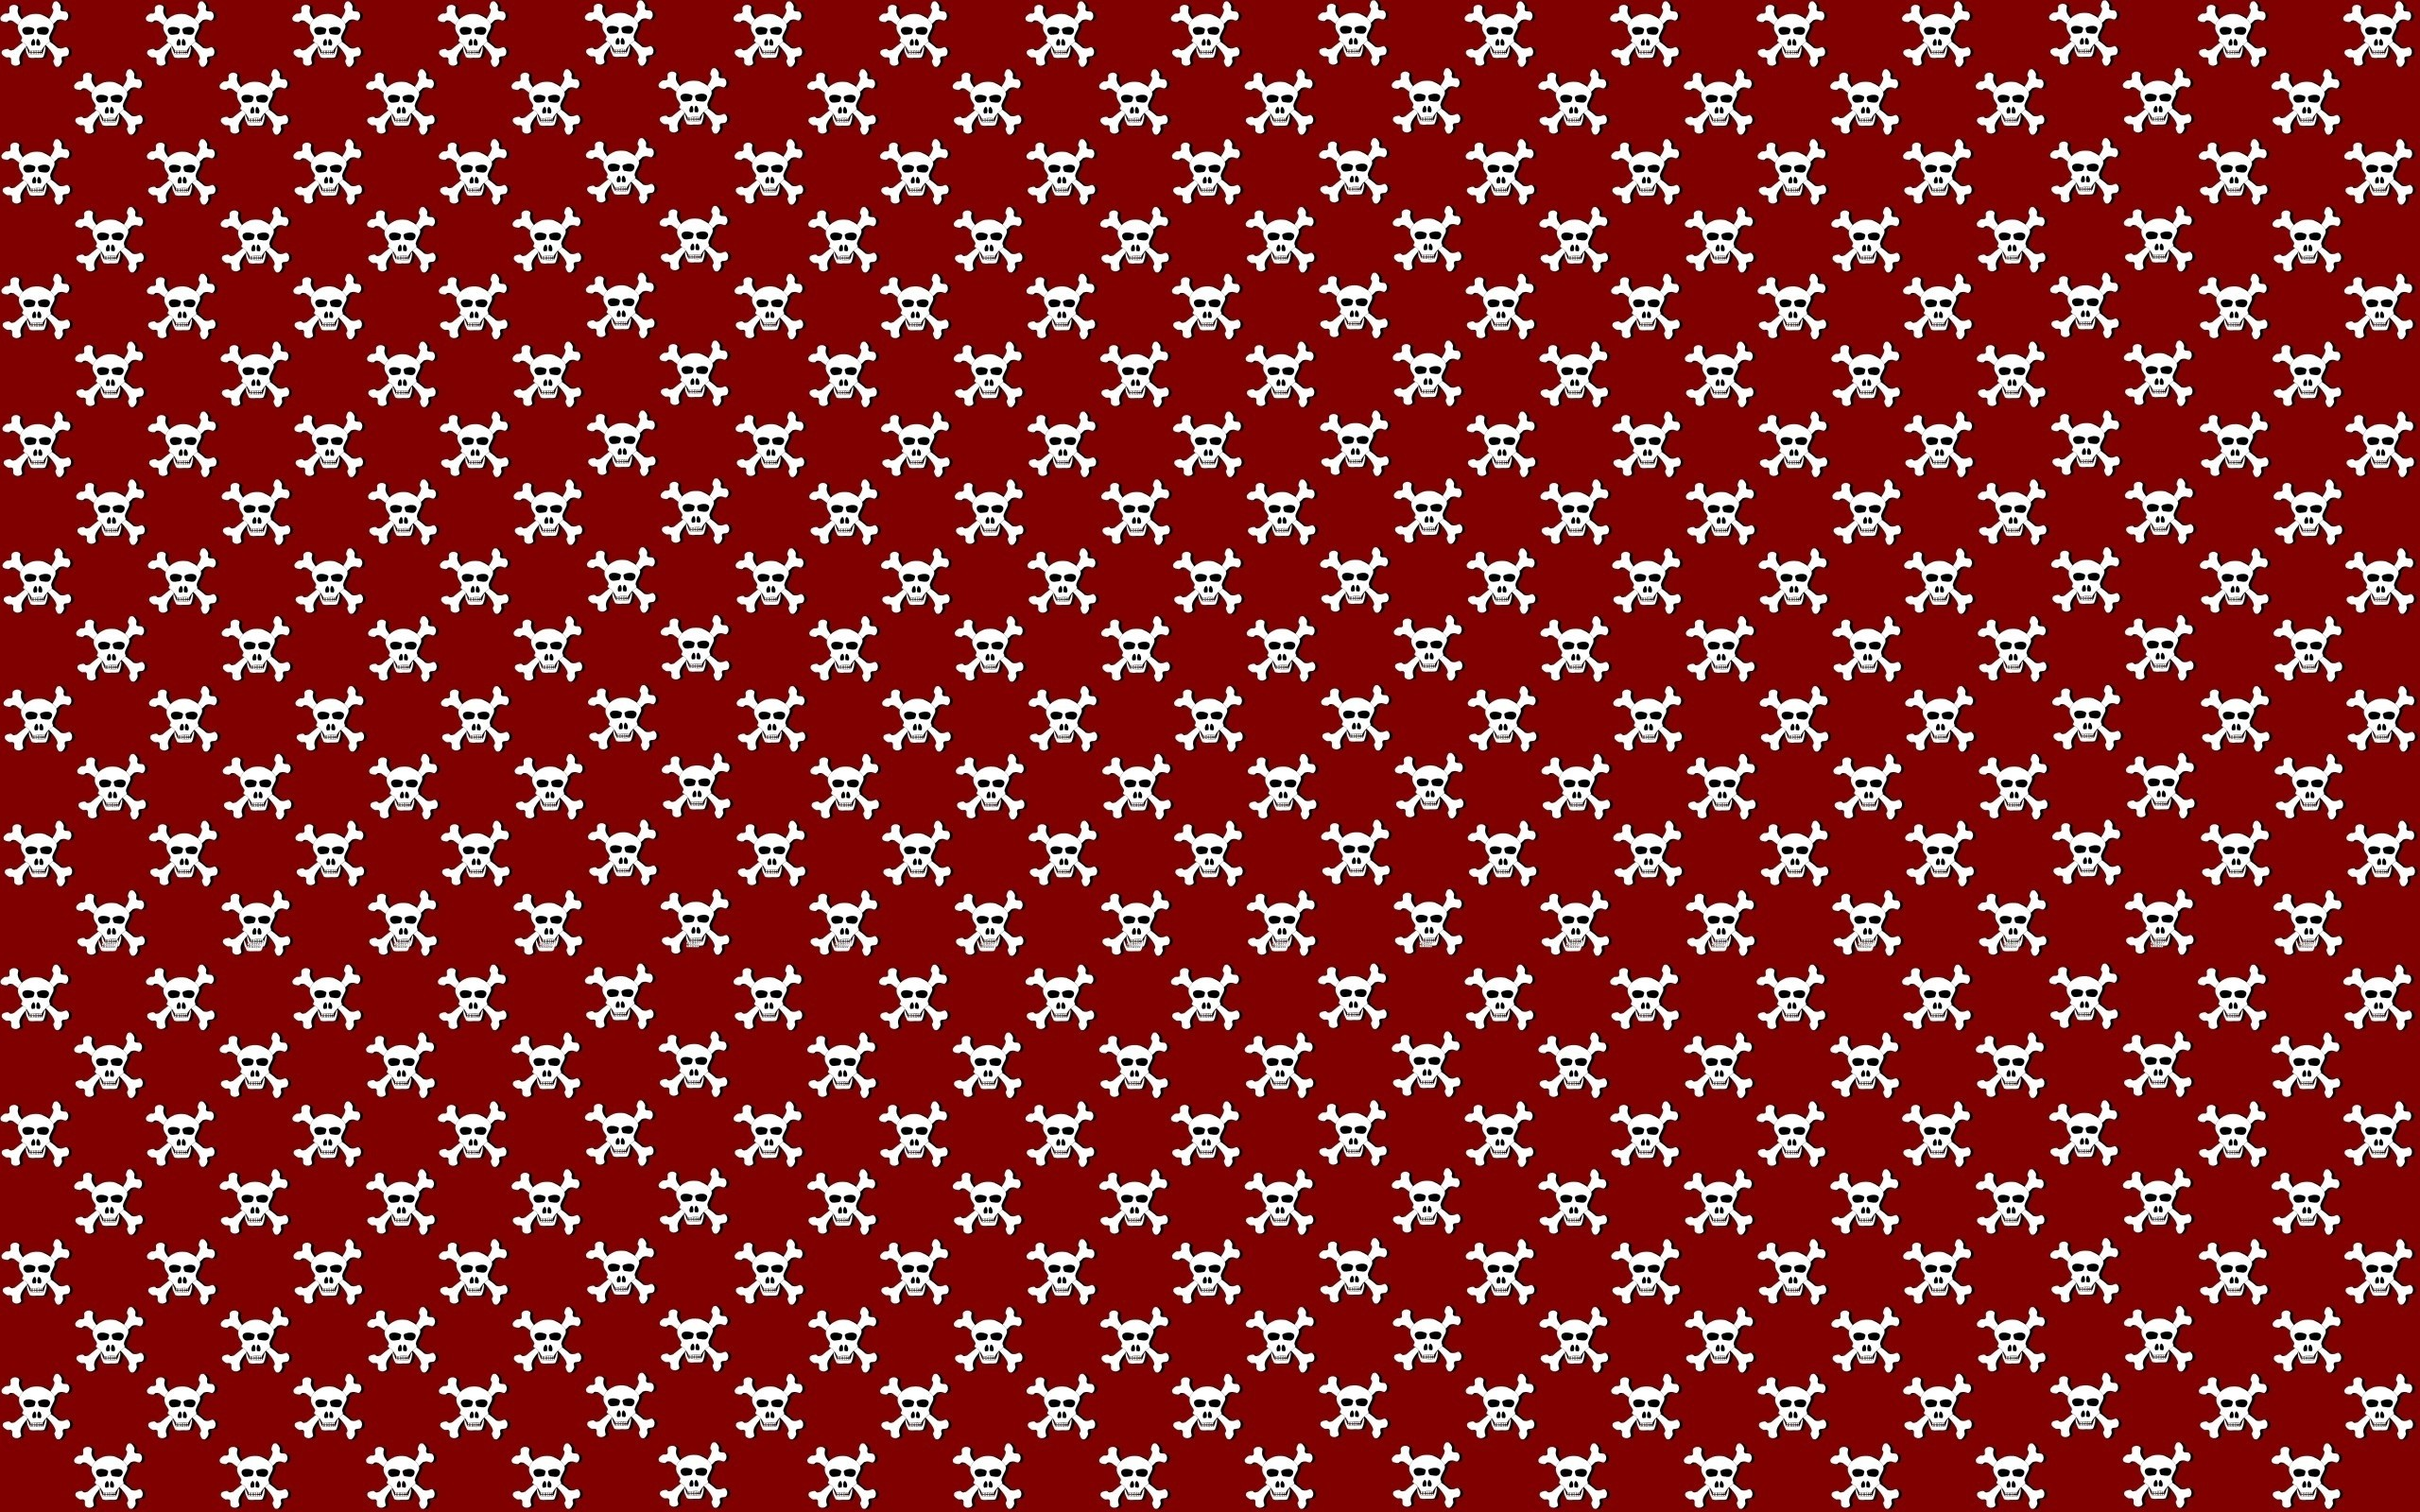 Skull Red Background Wallpaper At Dark Wallpapers